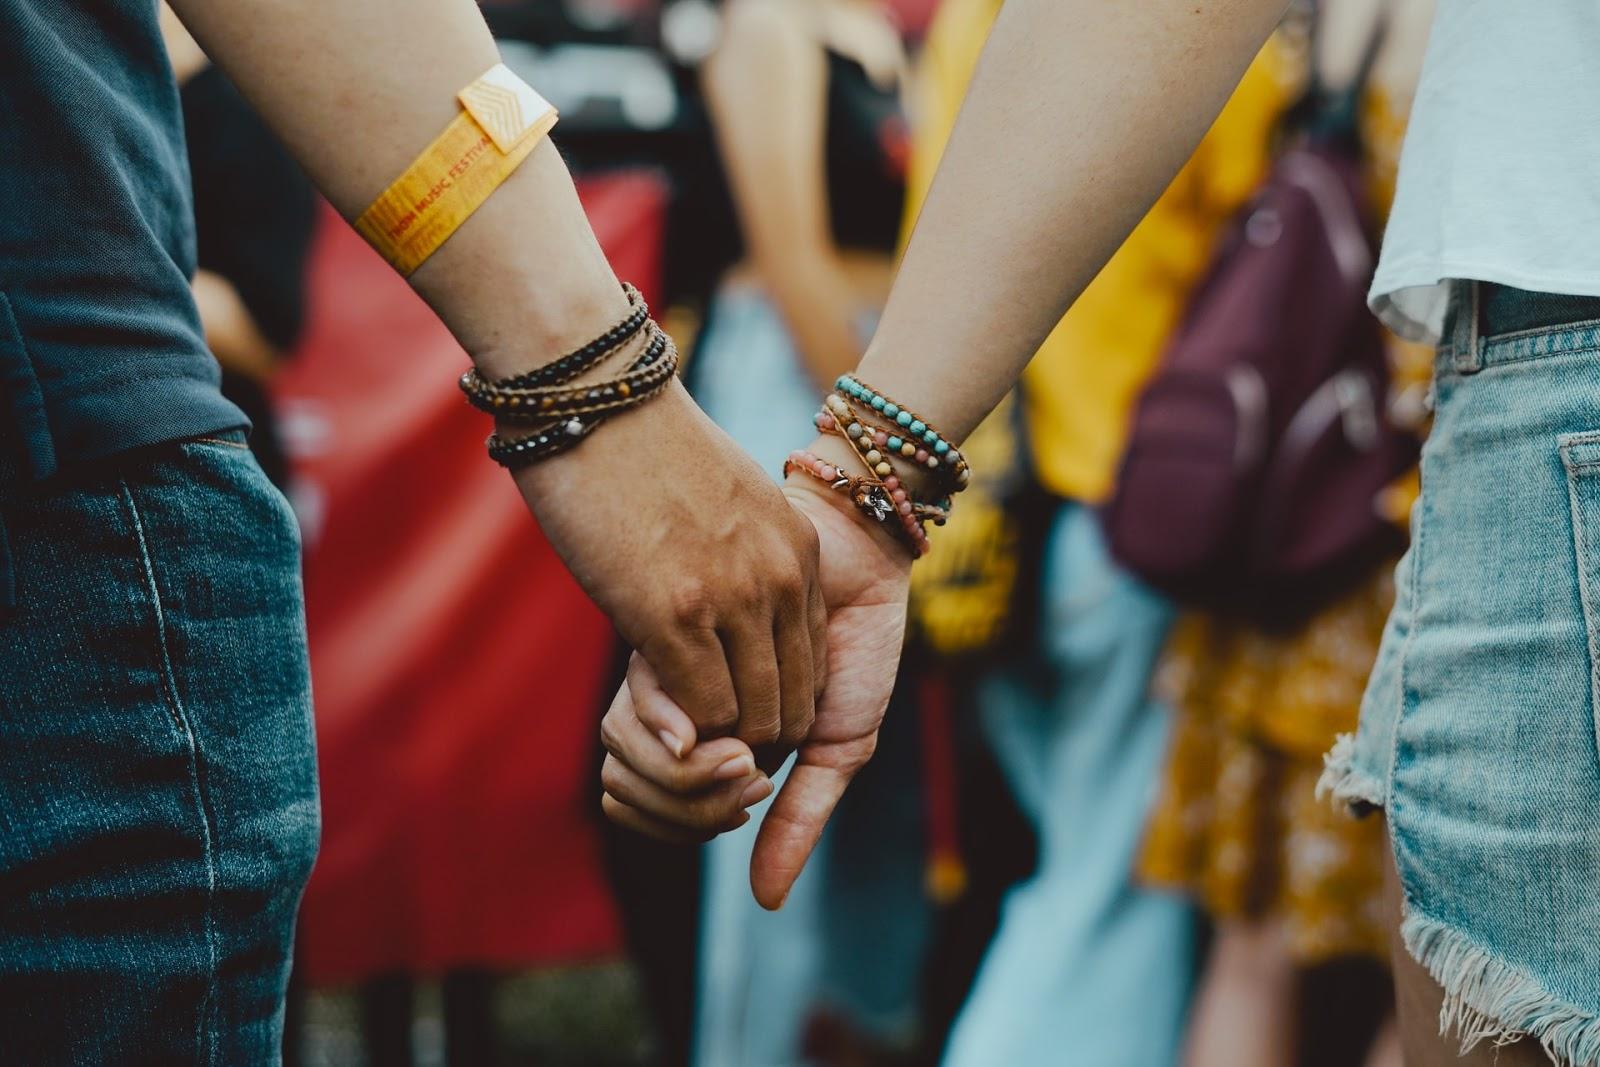 couple wearing bracelets holding hands